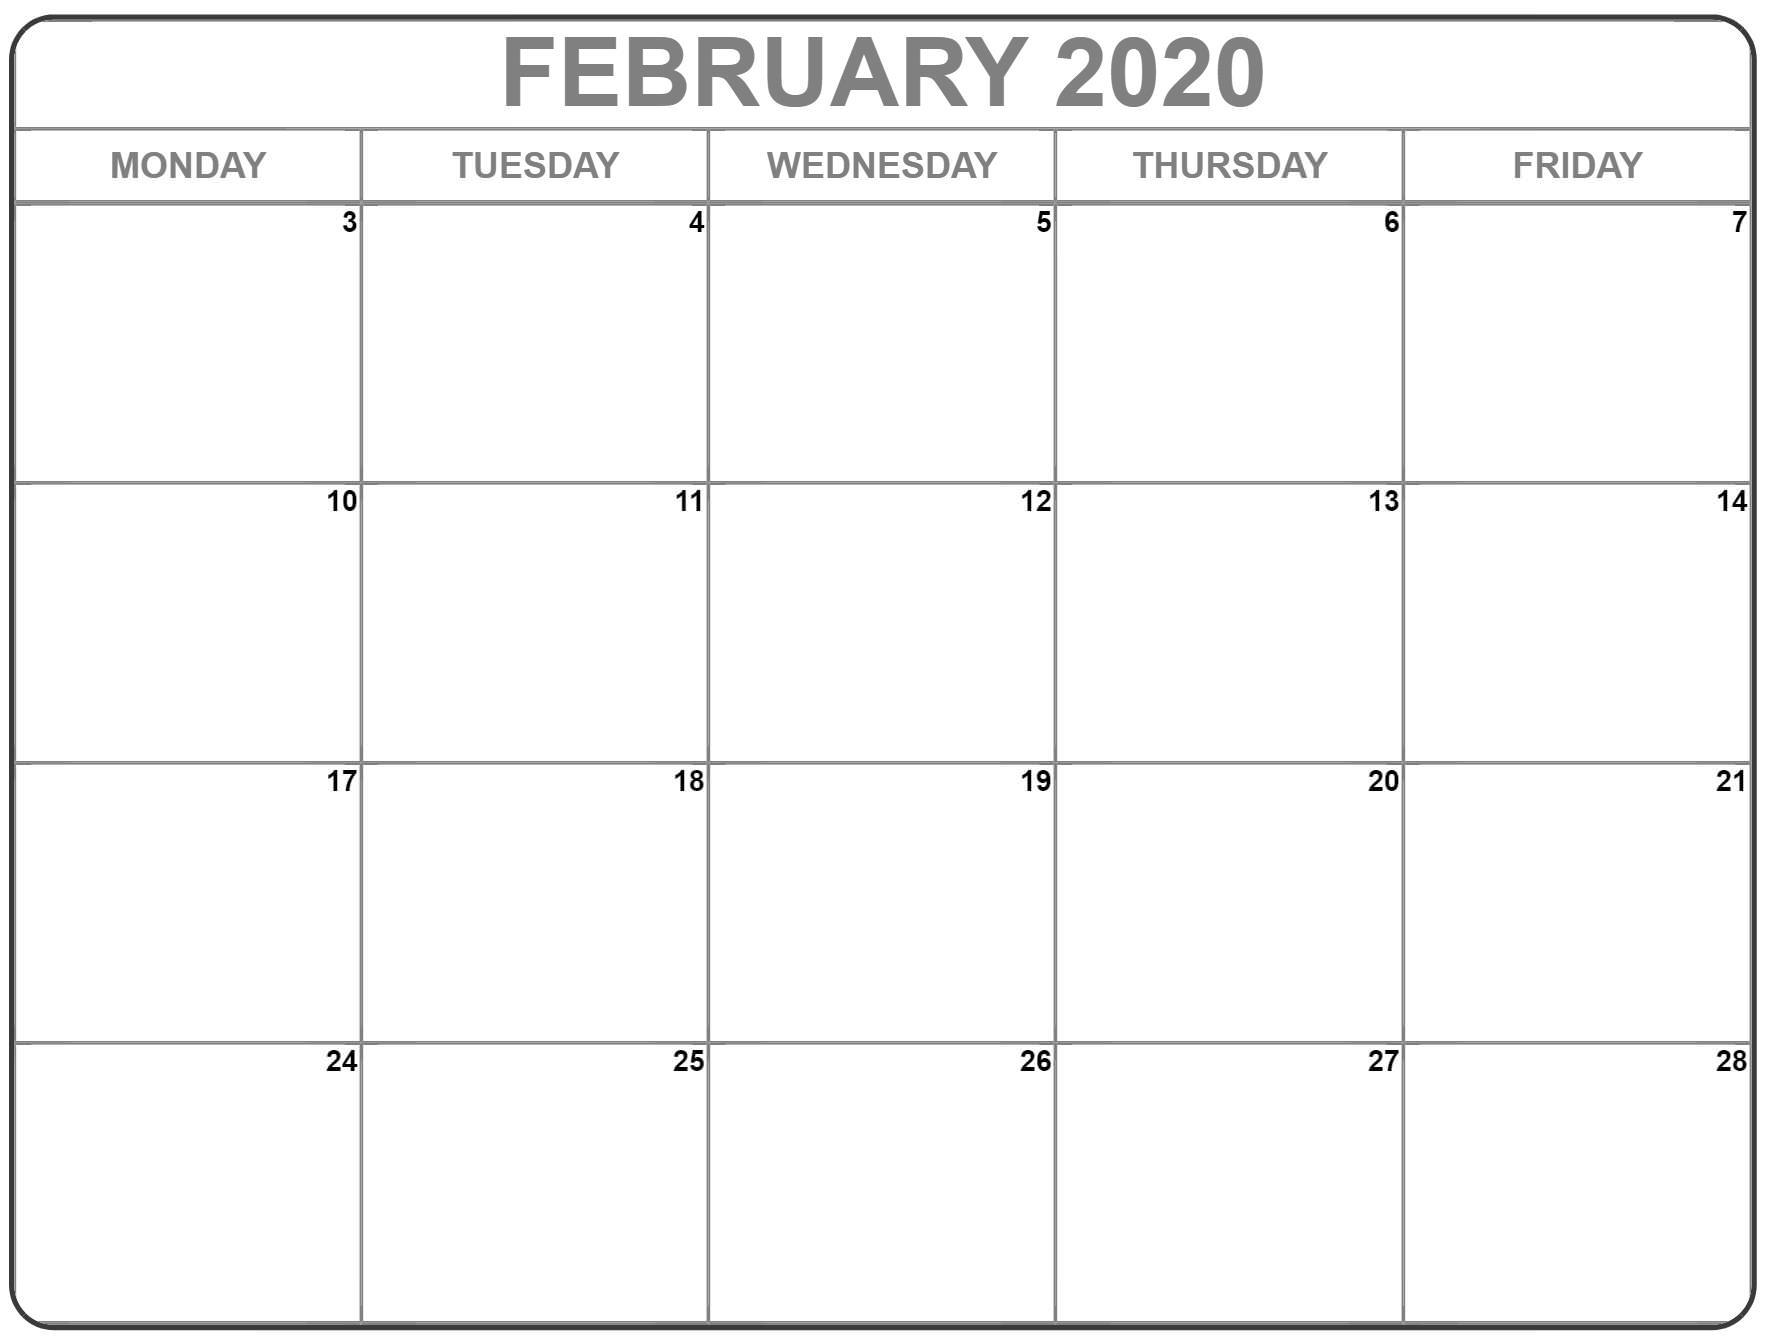 February 2020 Monday Calendar | Monday To Sunday